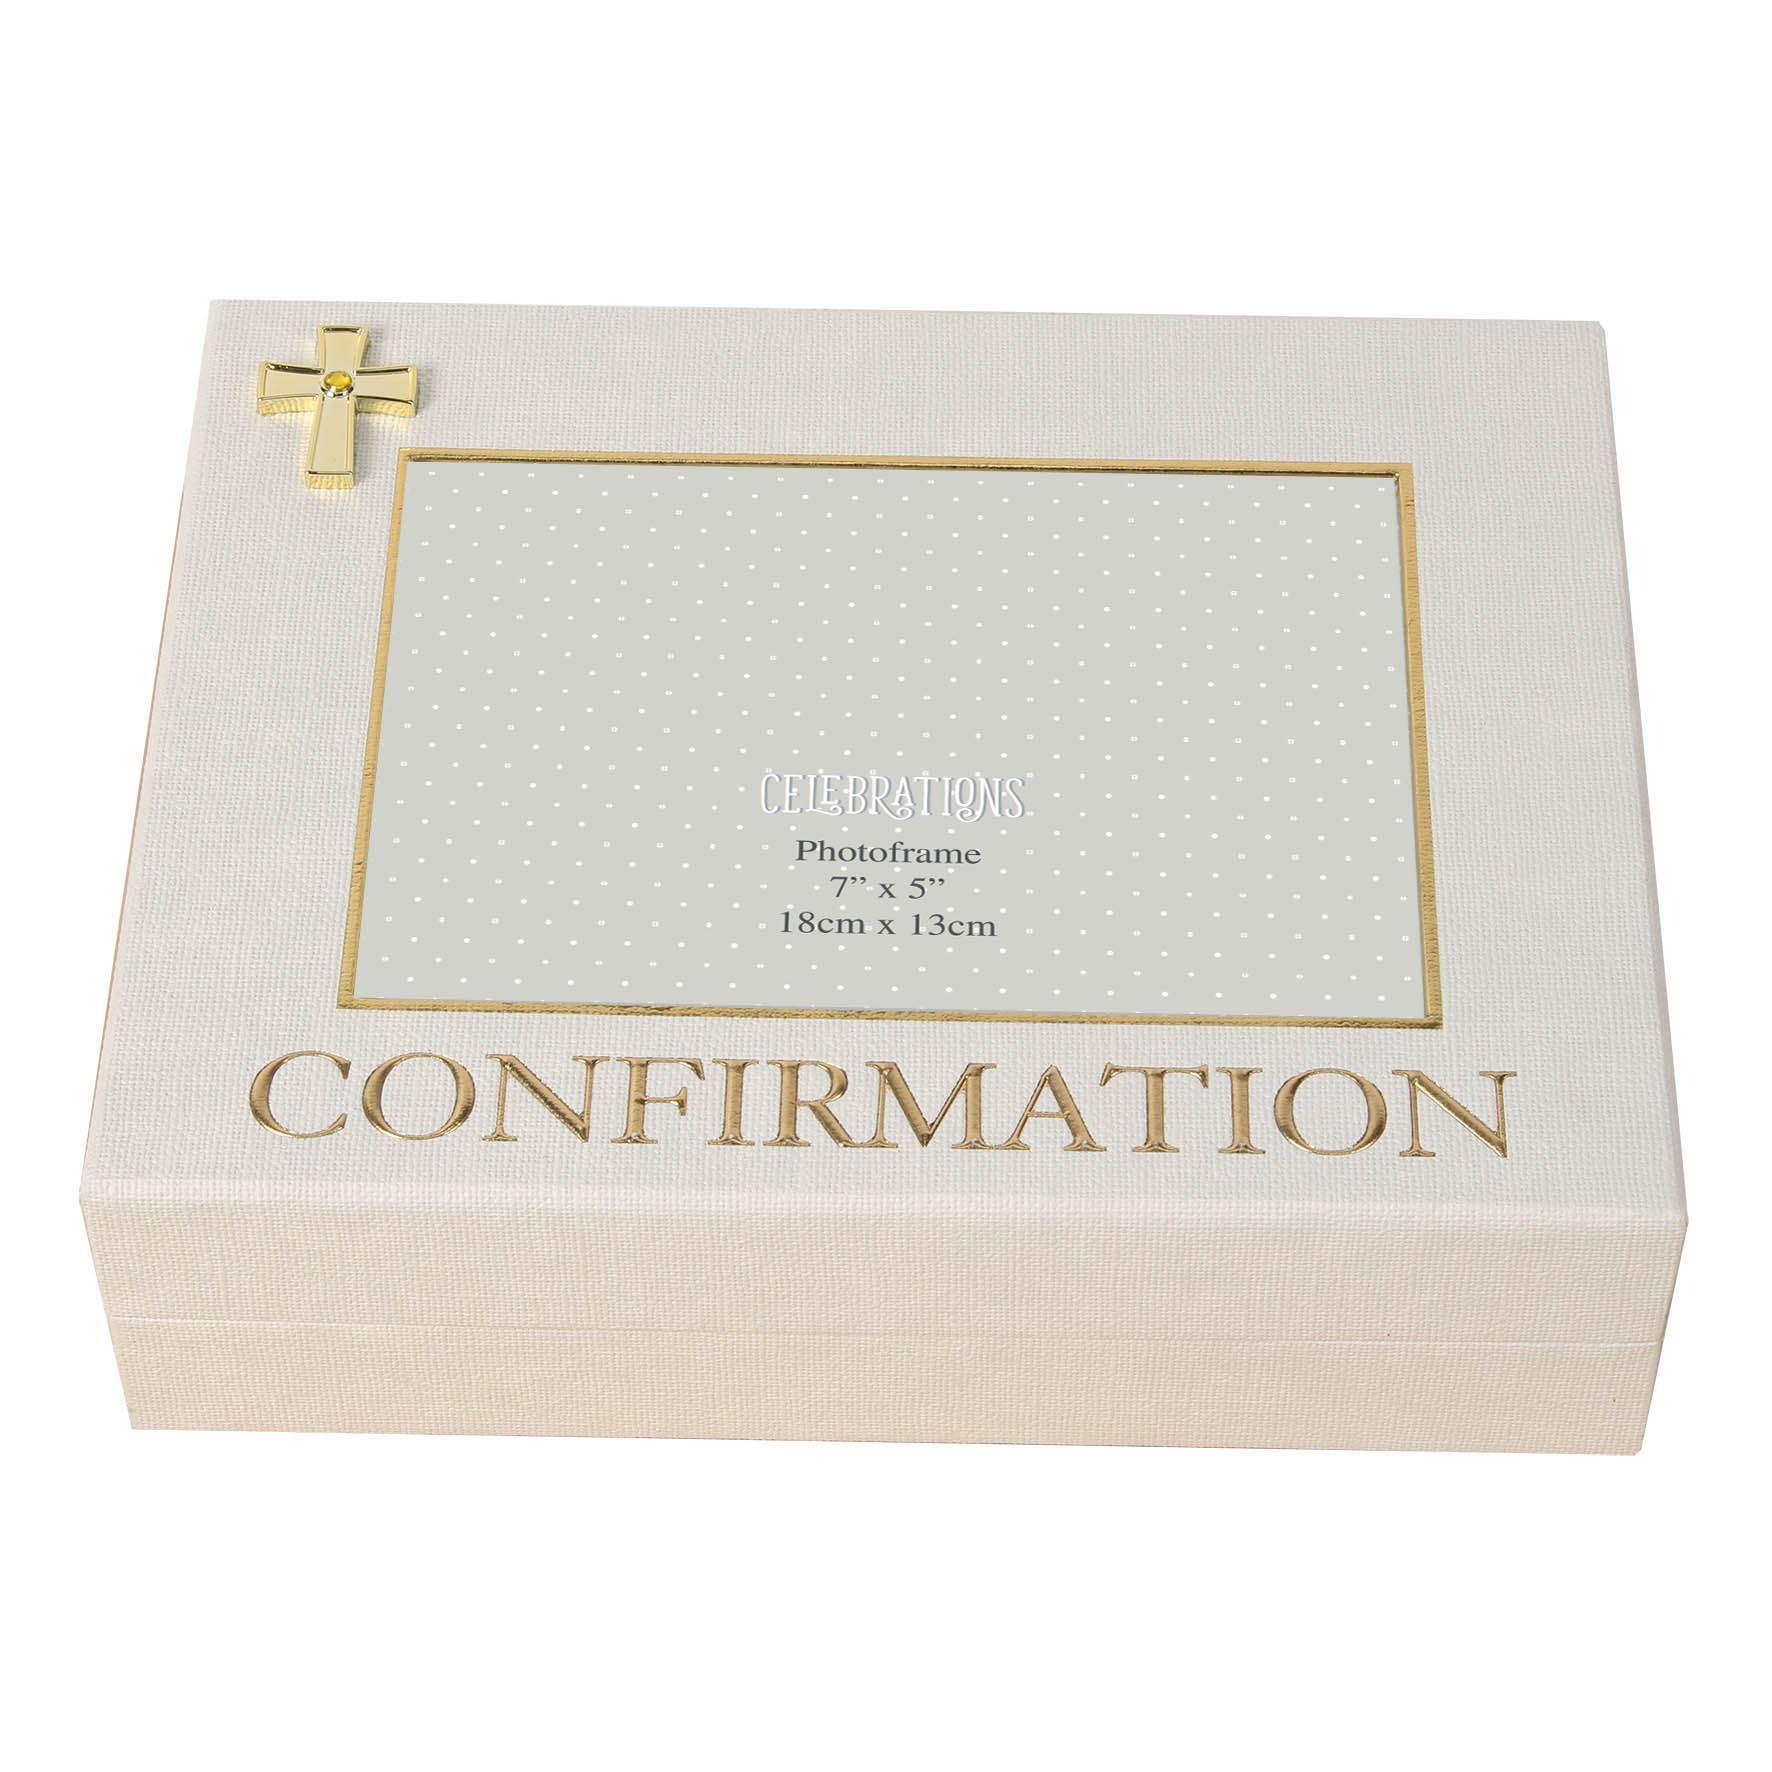 Celebrations Linen Look Keepsake Box - Confirmation